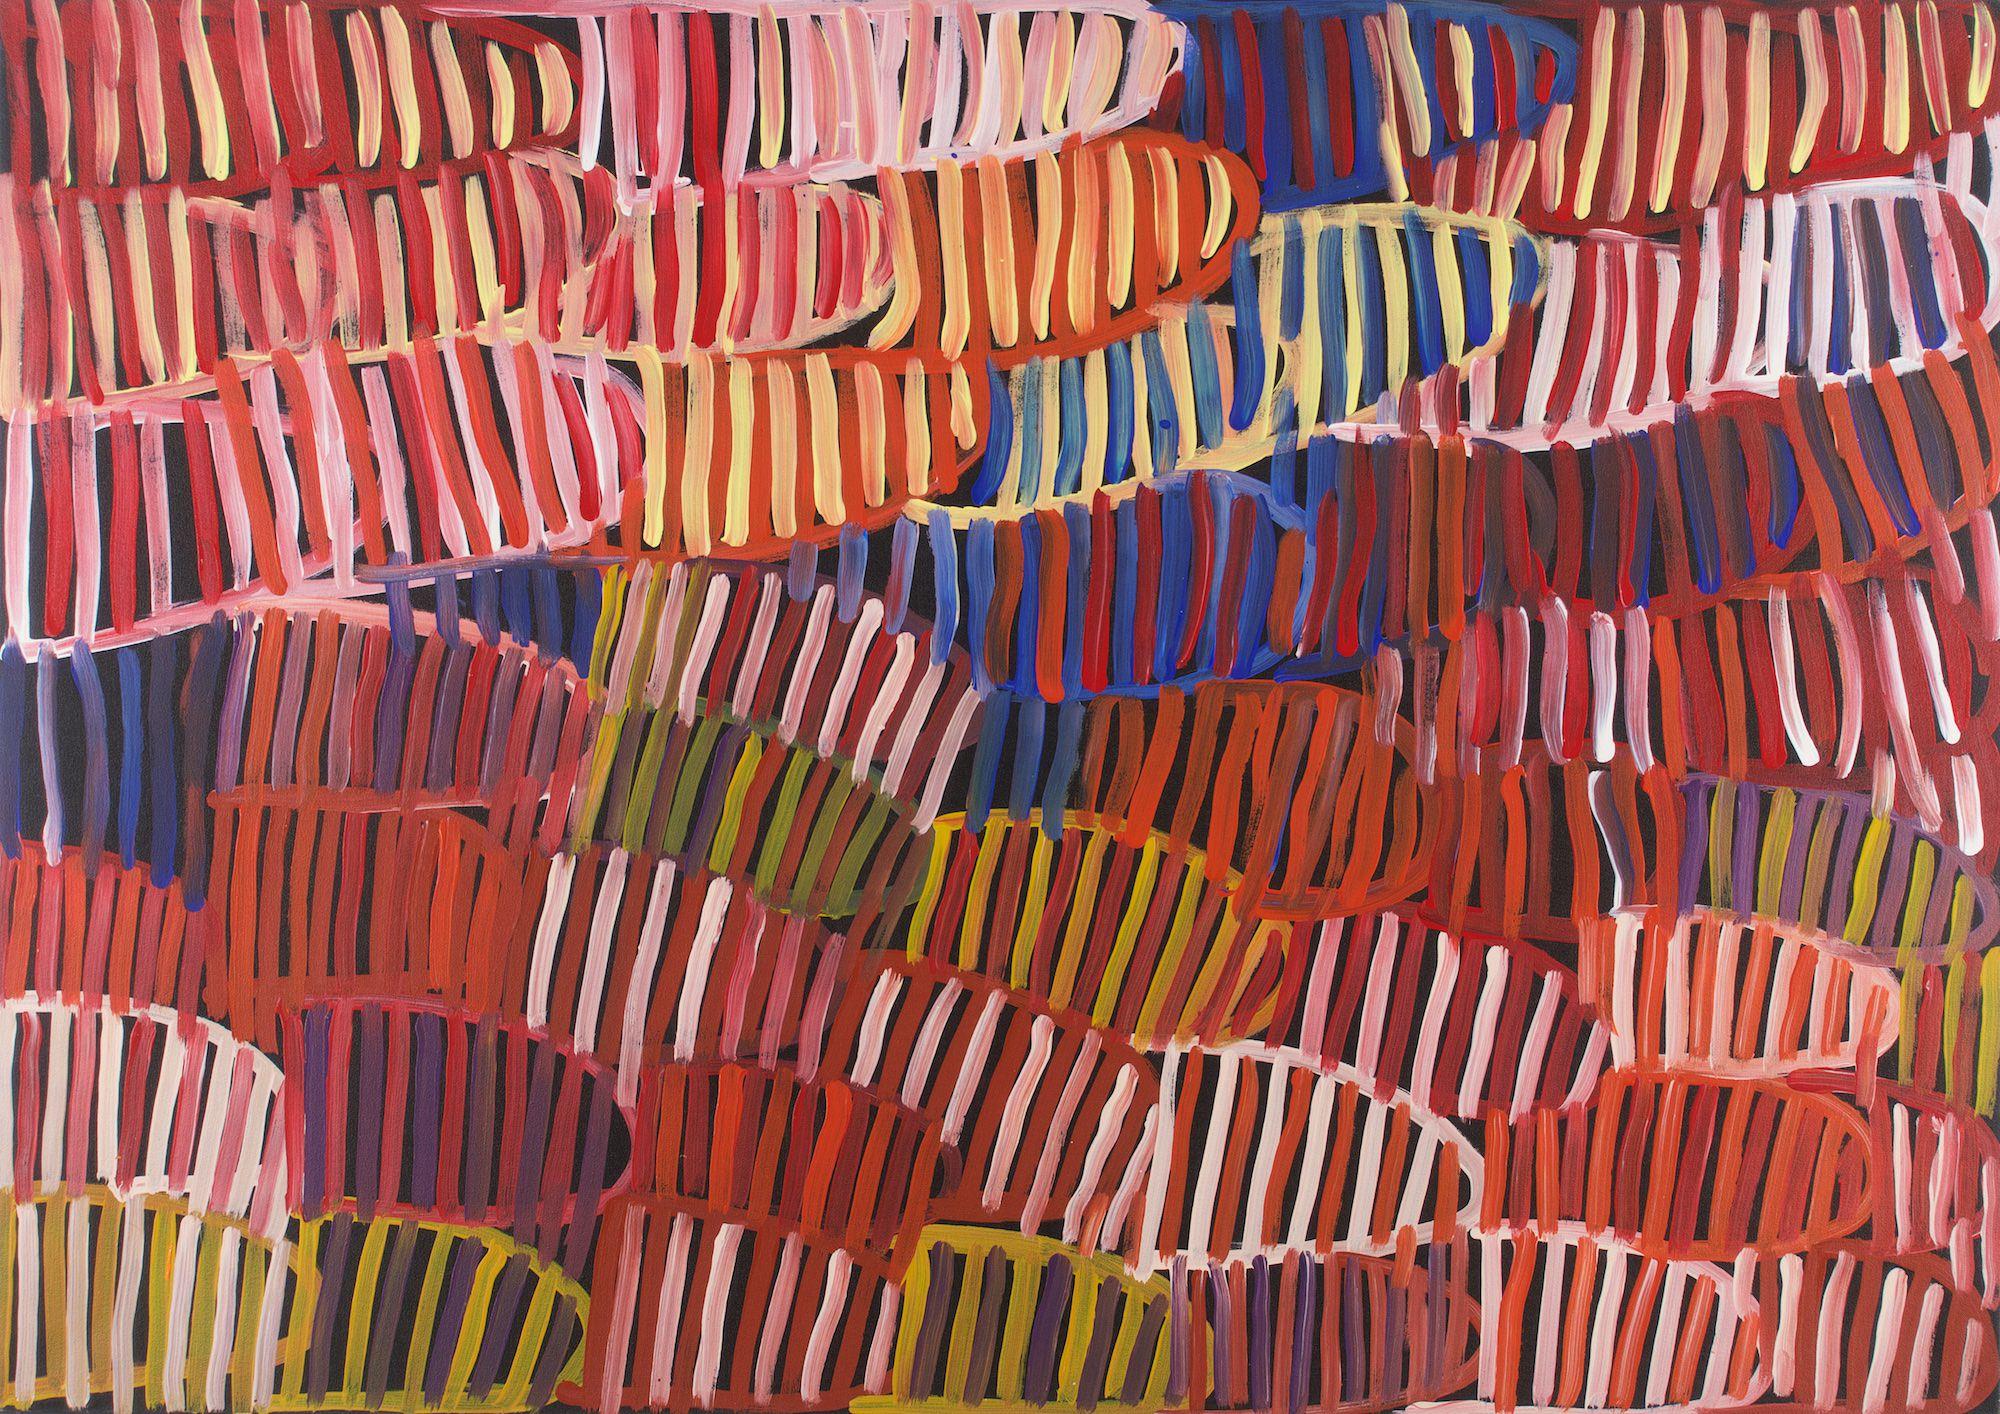 Minnie Pwerle Body Paint 2004 acrylic on canvas 127 x 90 cm #16552